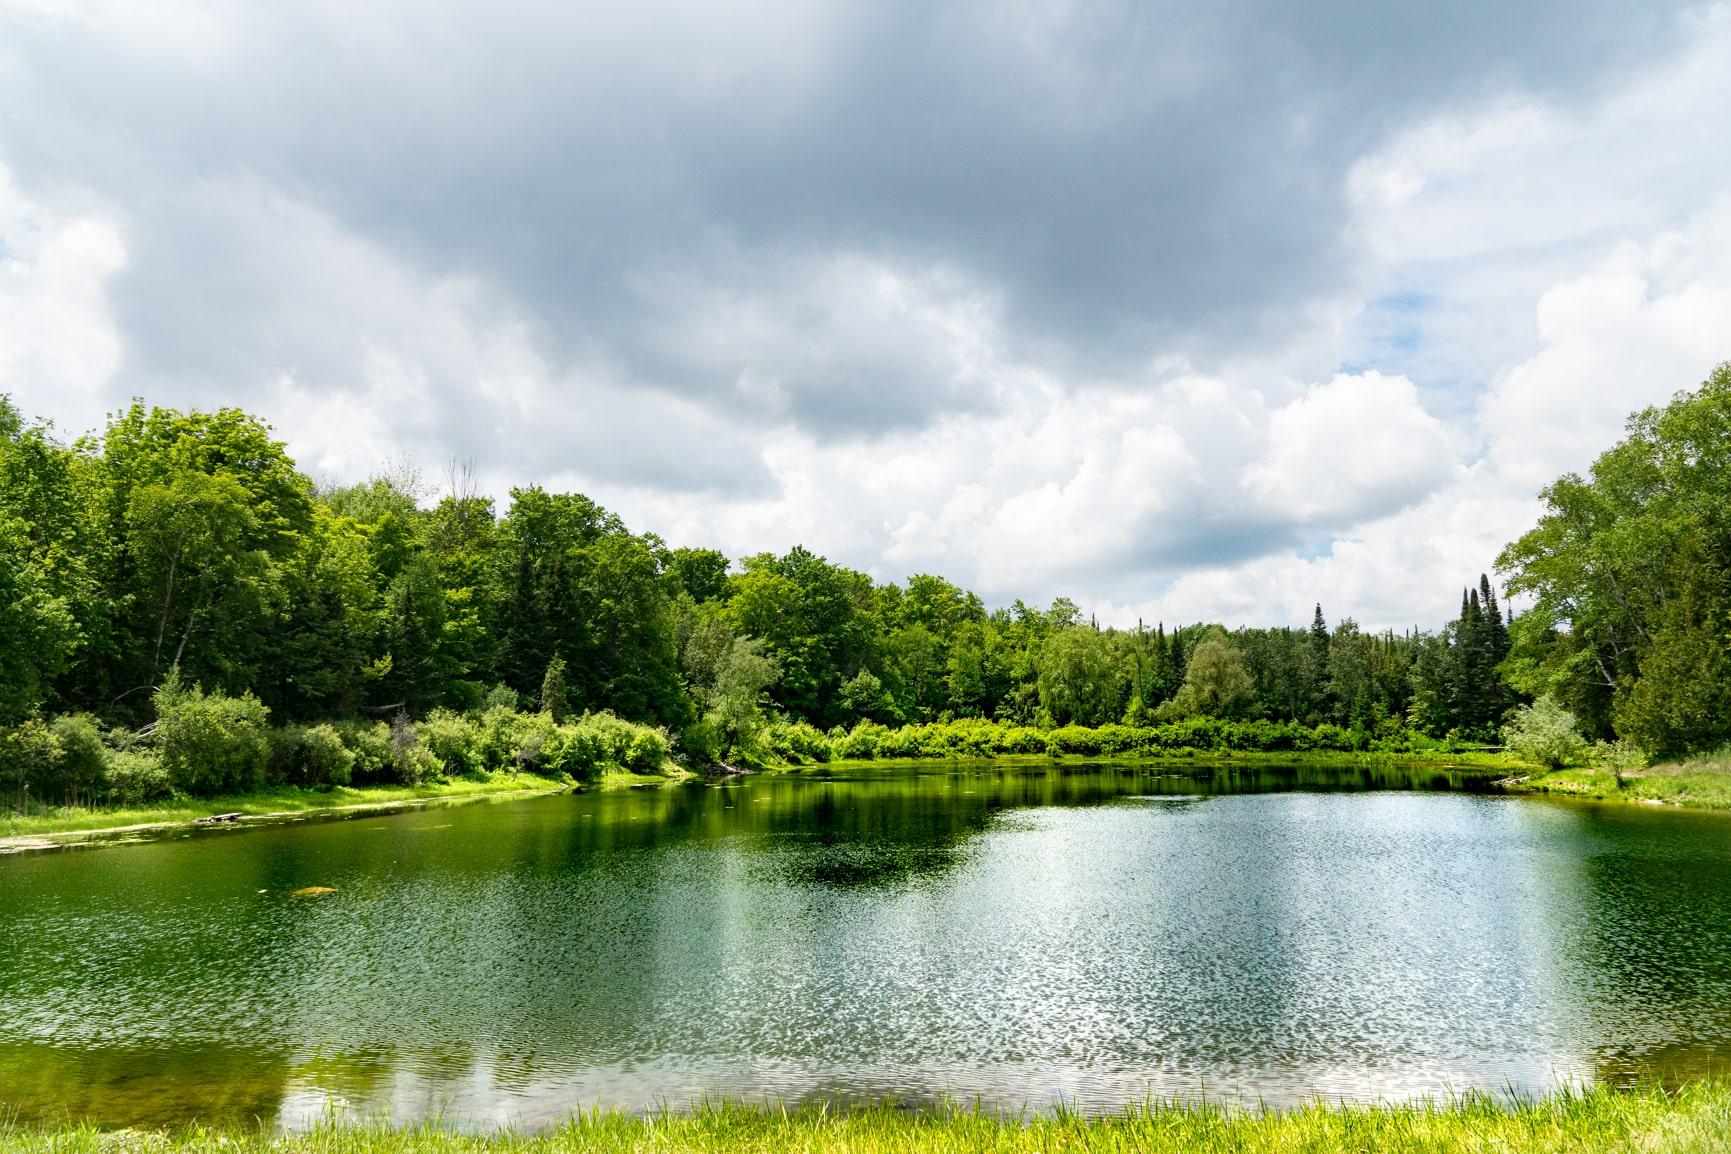 Pond at Monora Park